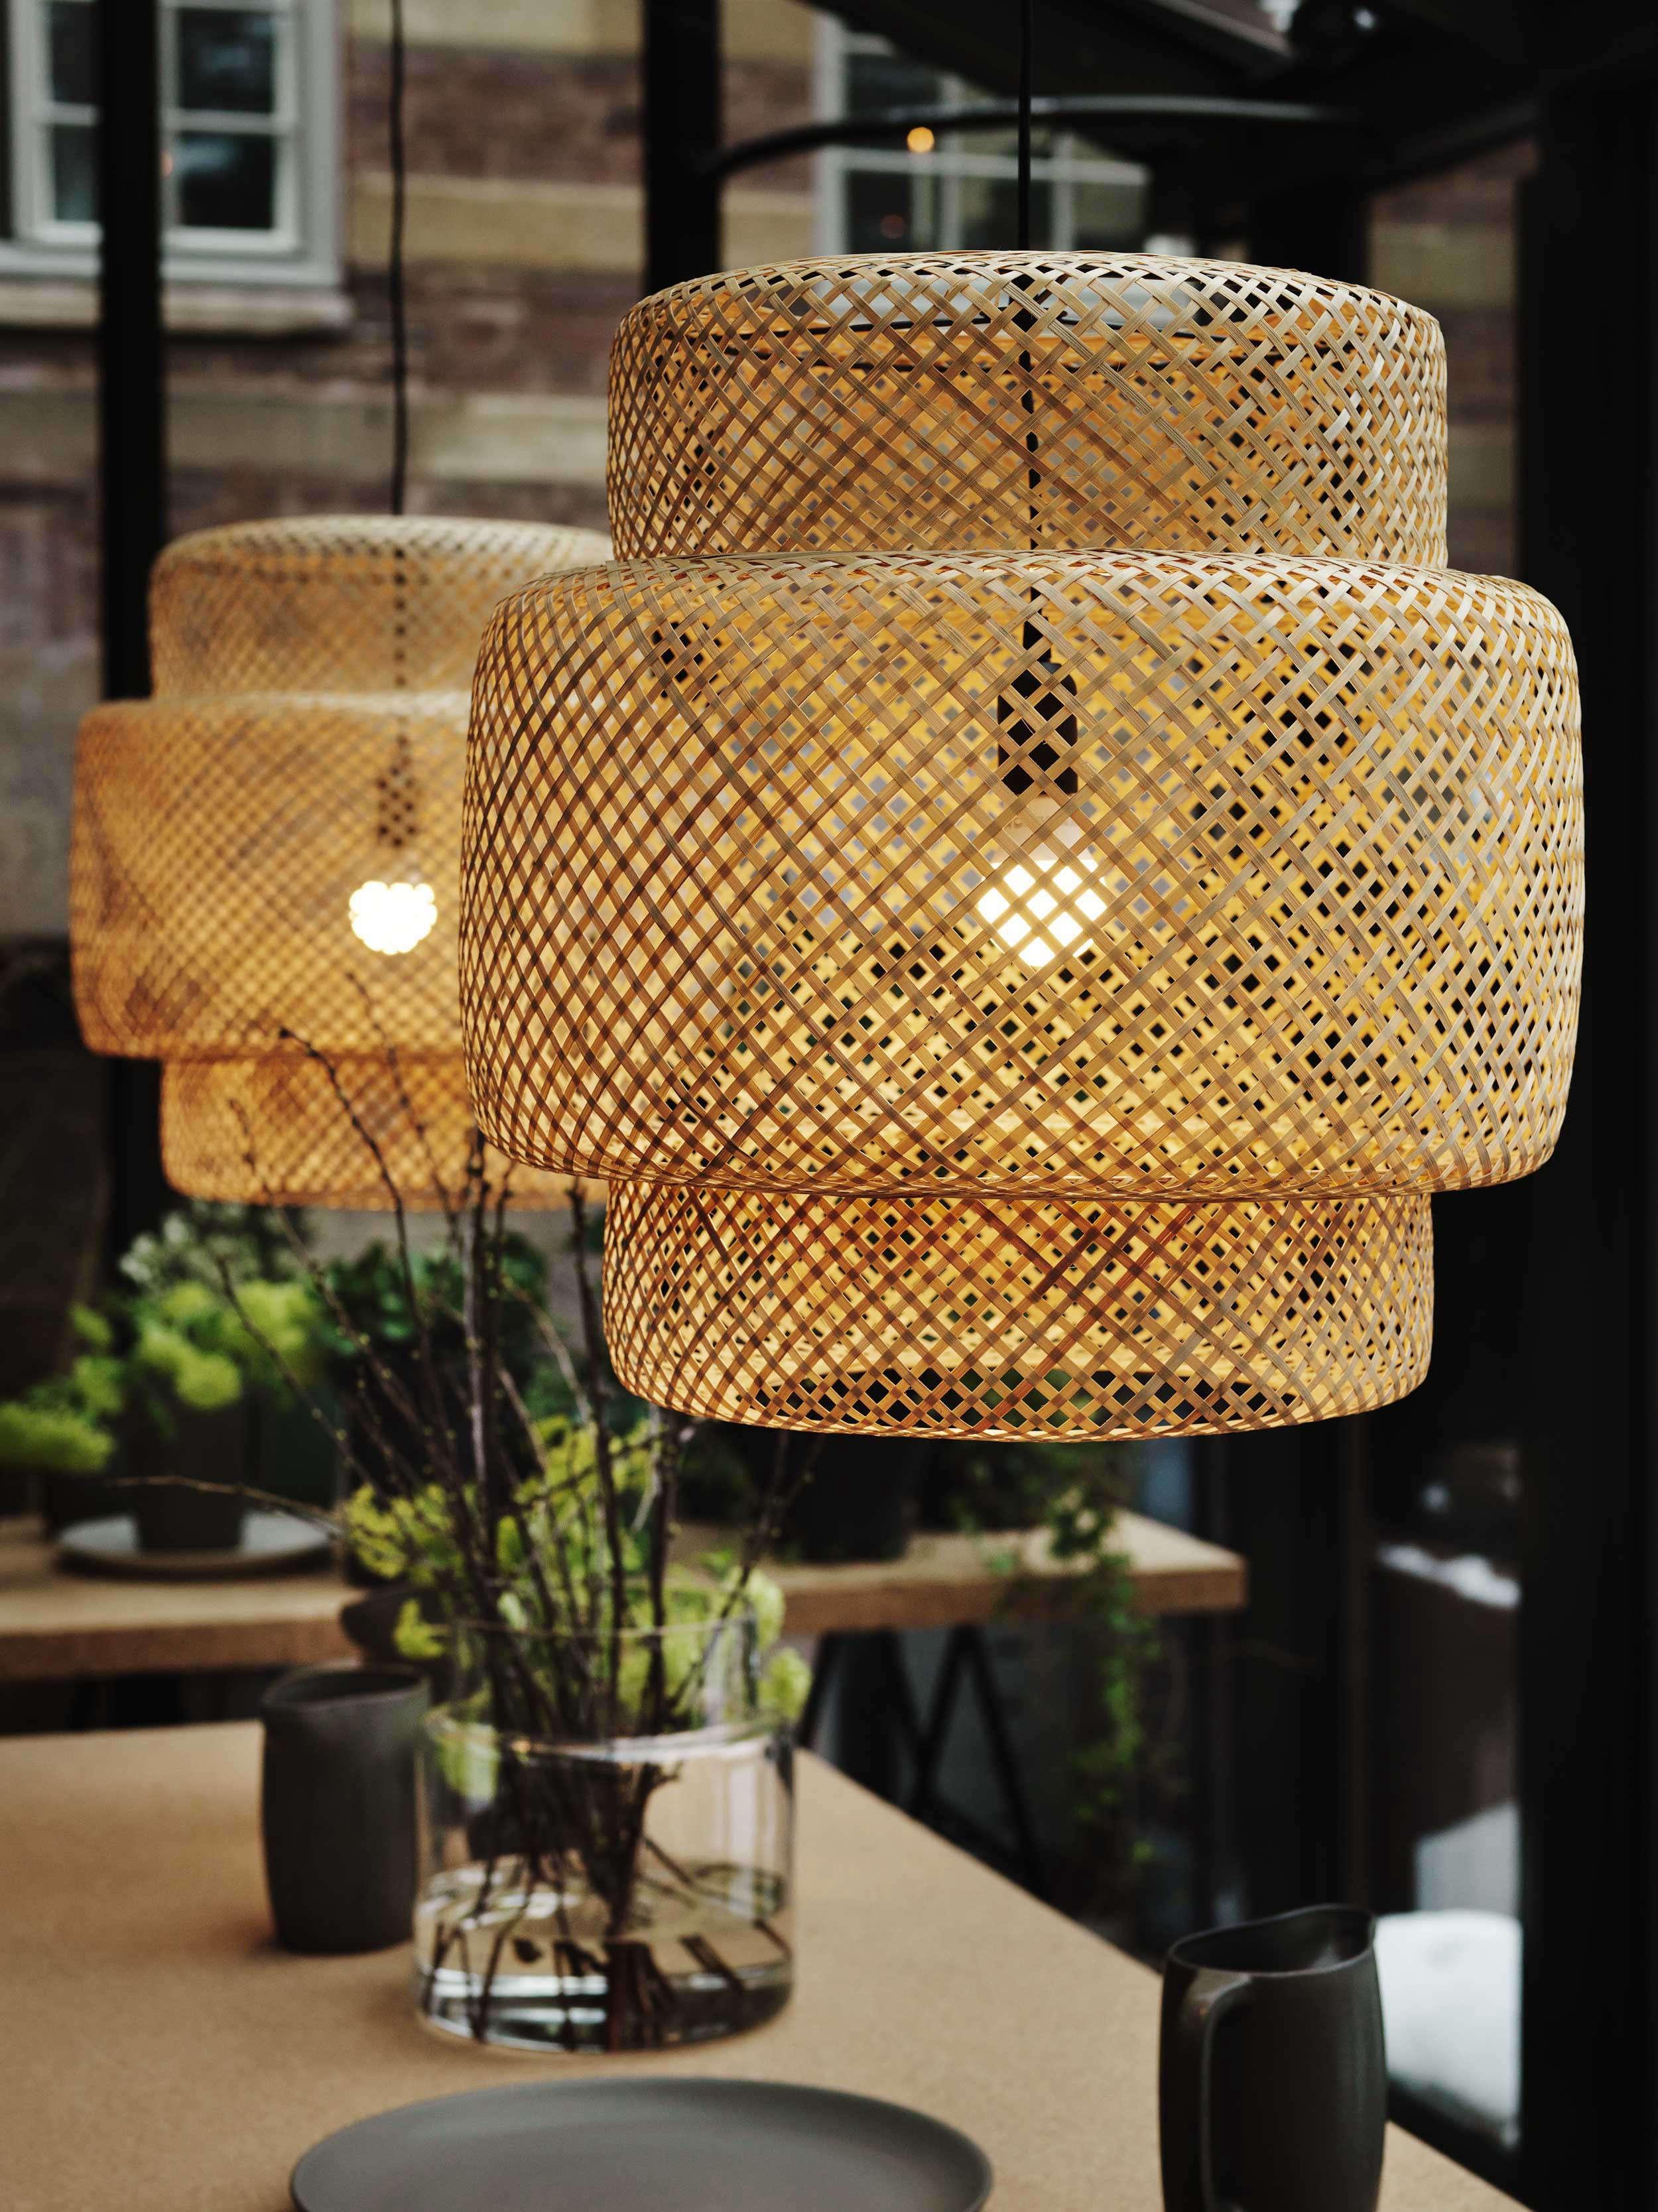 Ikea—Sinnerlig-collection-by-StudioIlse-Remodelista